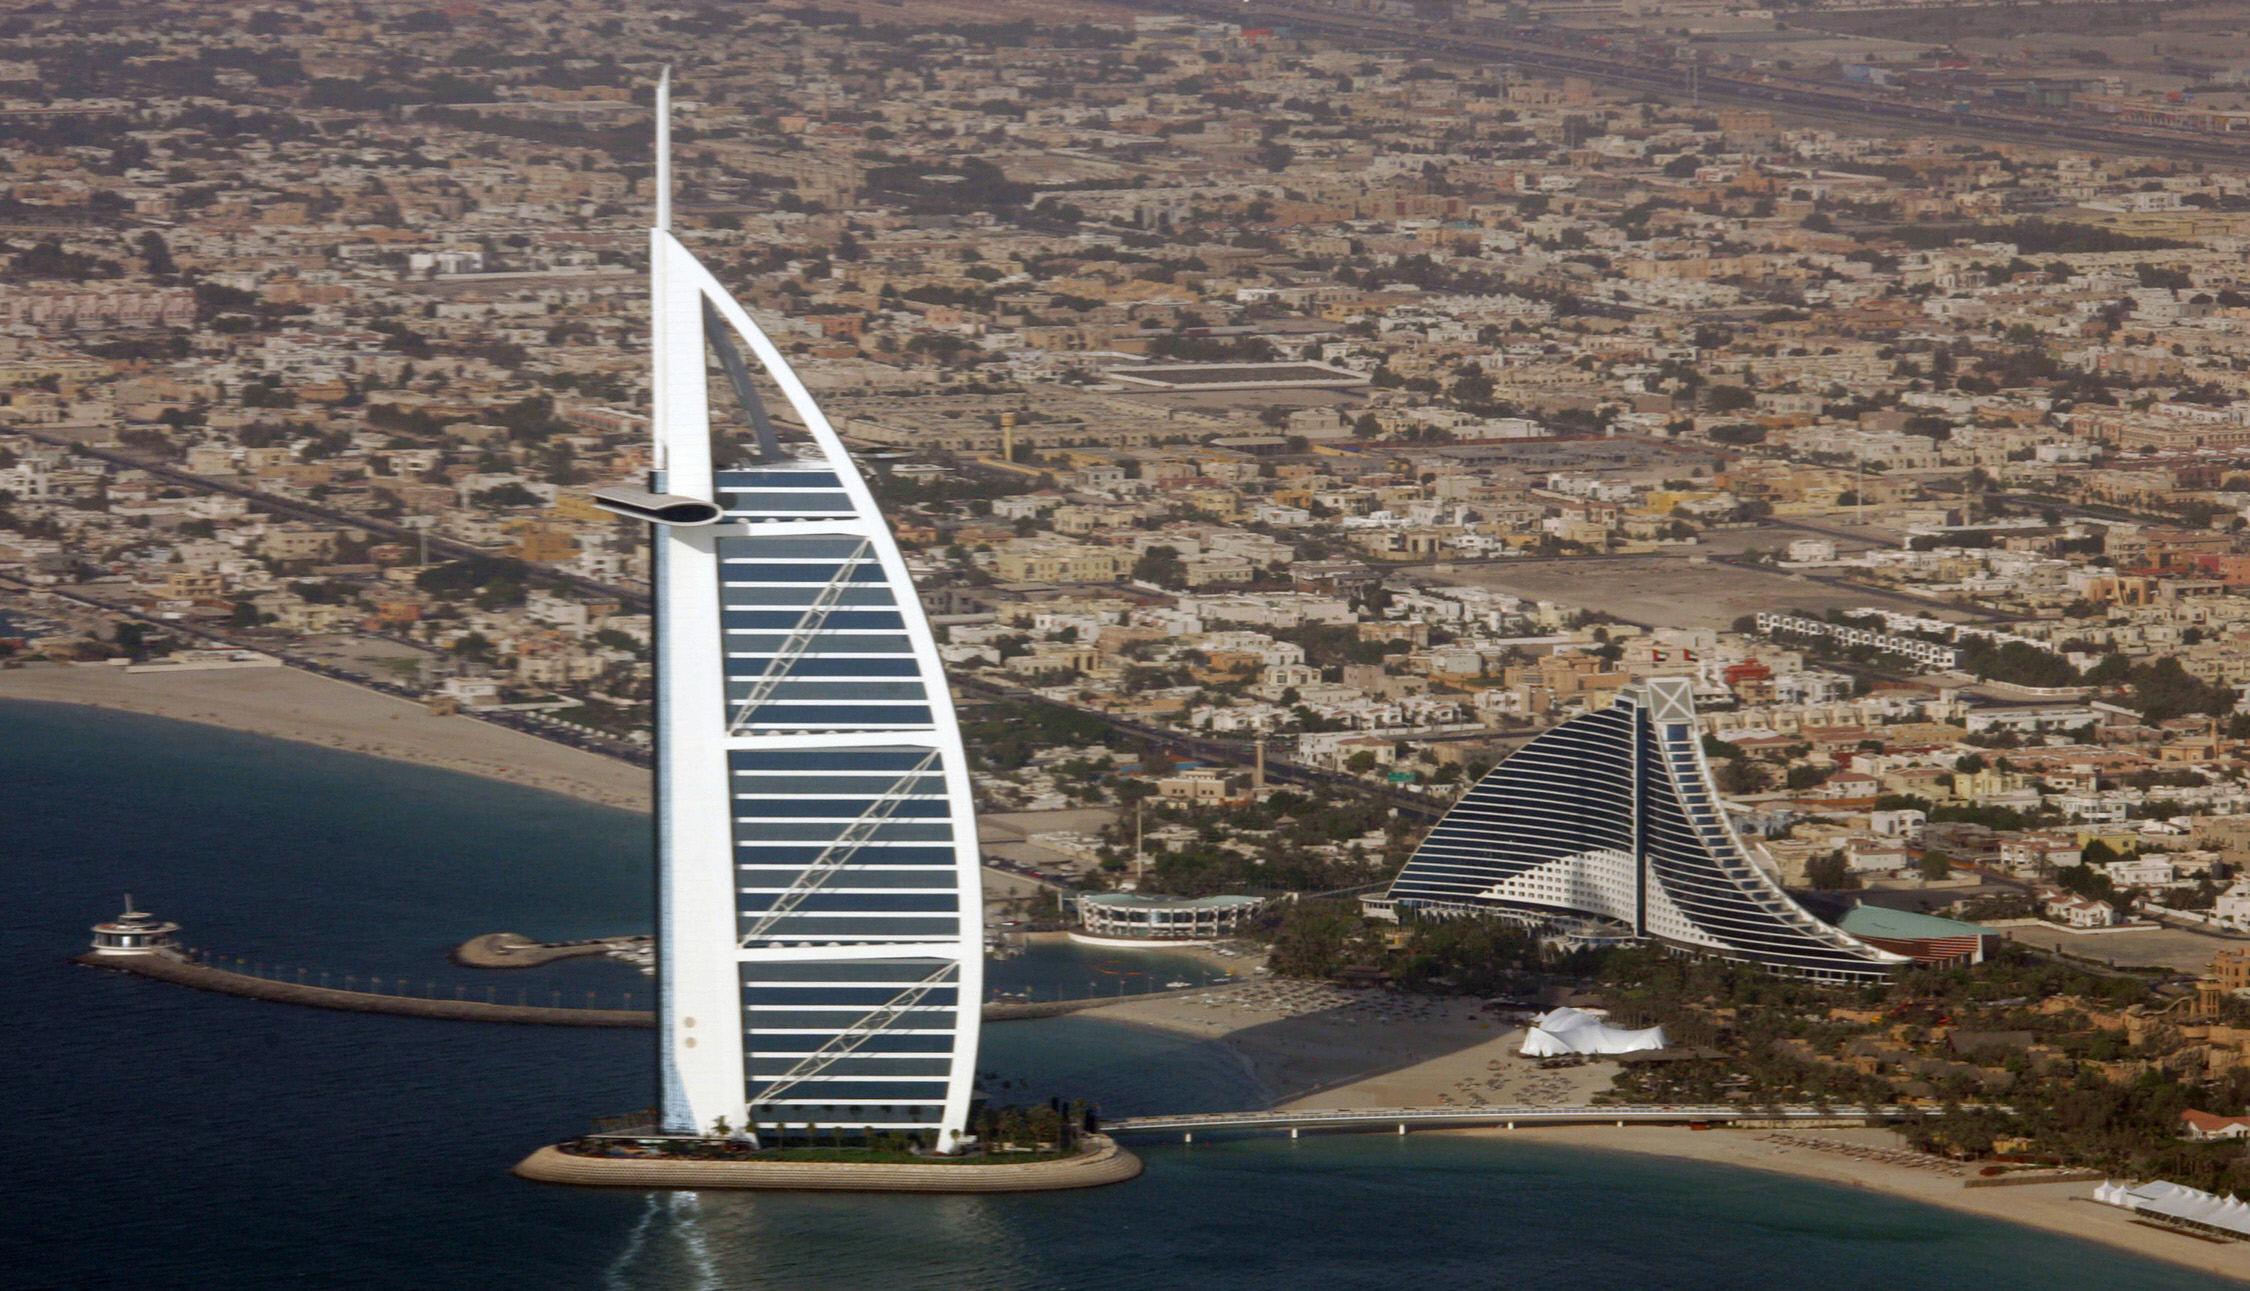 Dubajuje – pirmoji bankinių technologijų konferencija regione